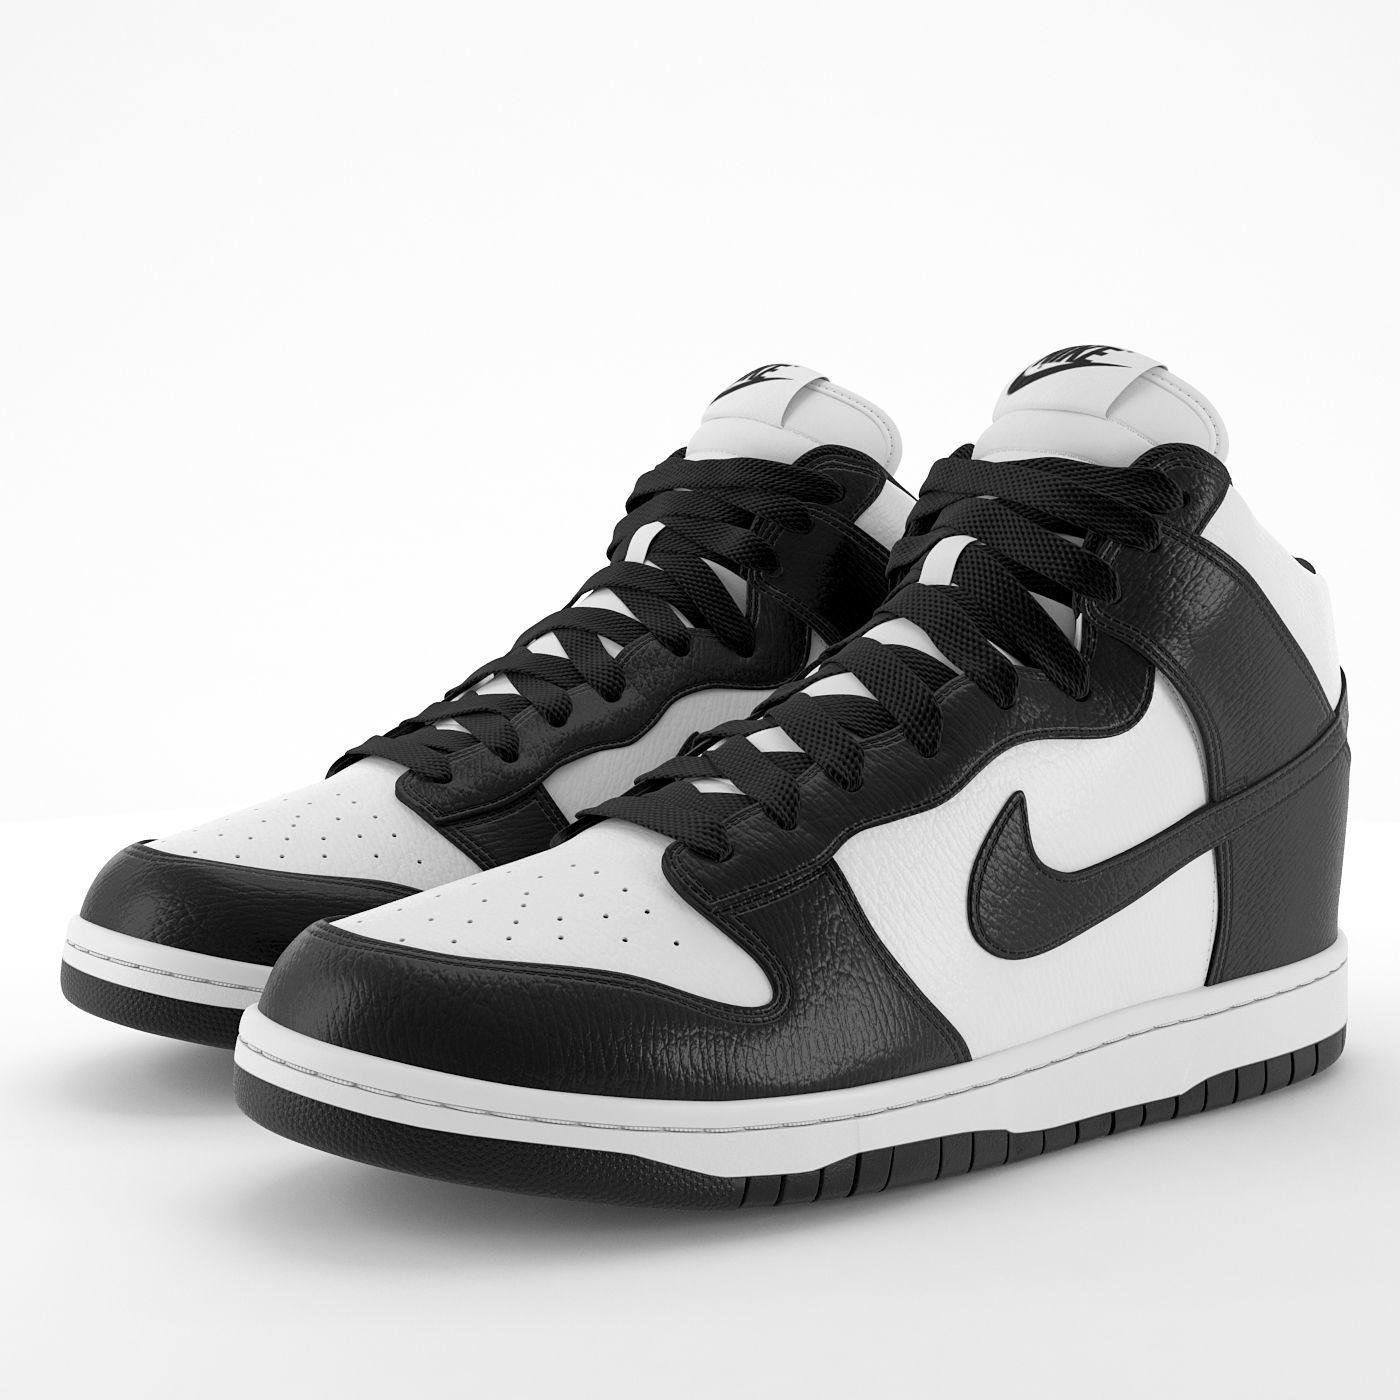 Nike Dunk High Black PBR